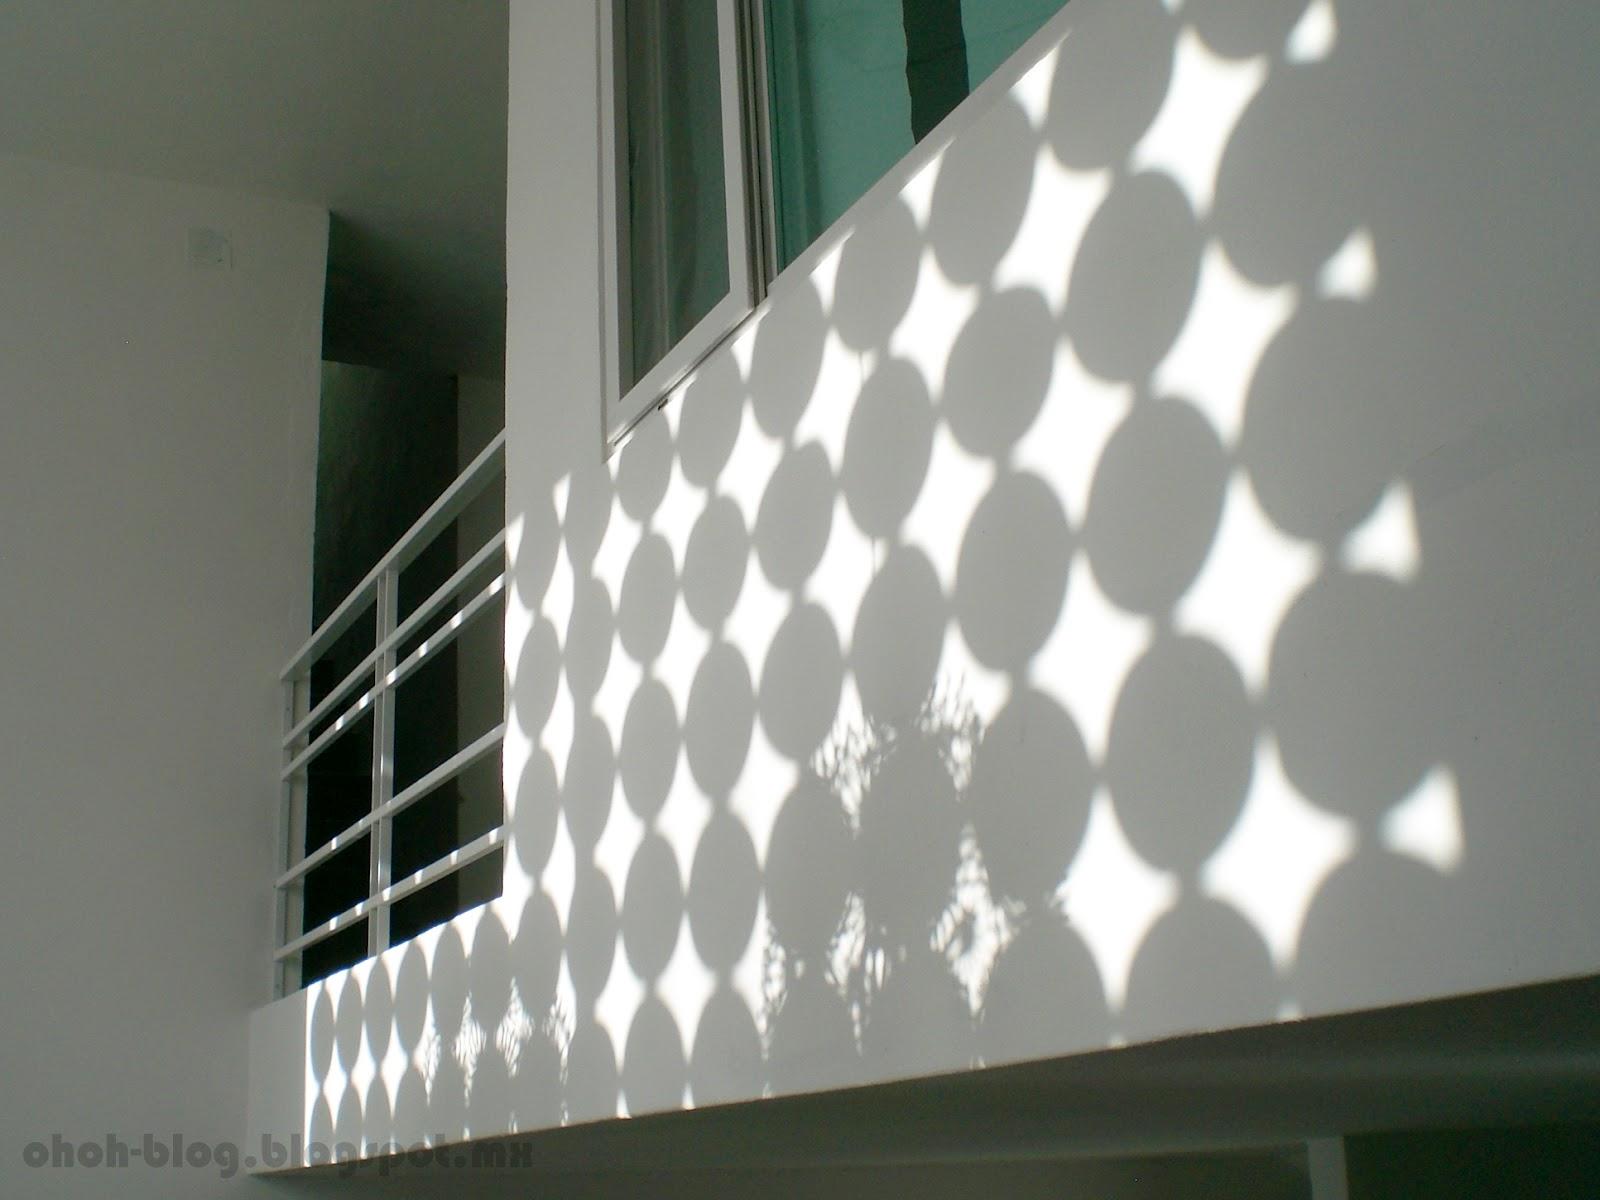 DIY Paper curtain - Persianas de papel - Ohoh Blog